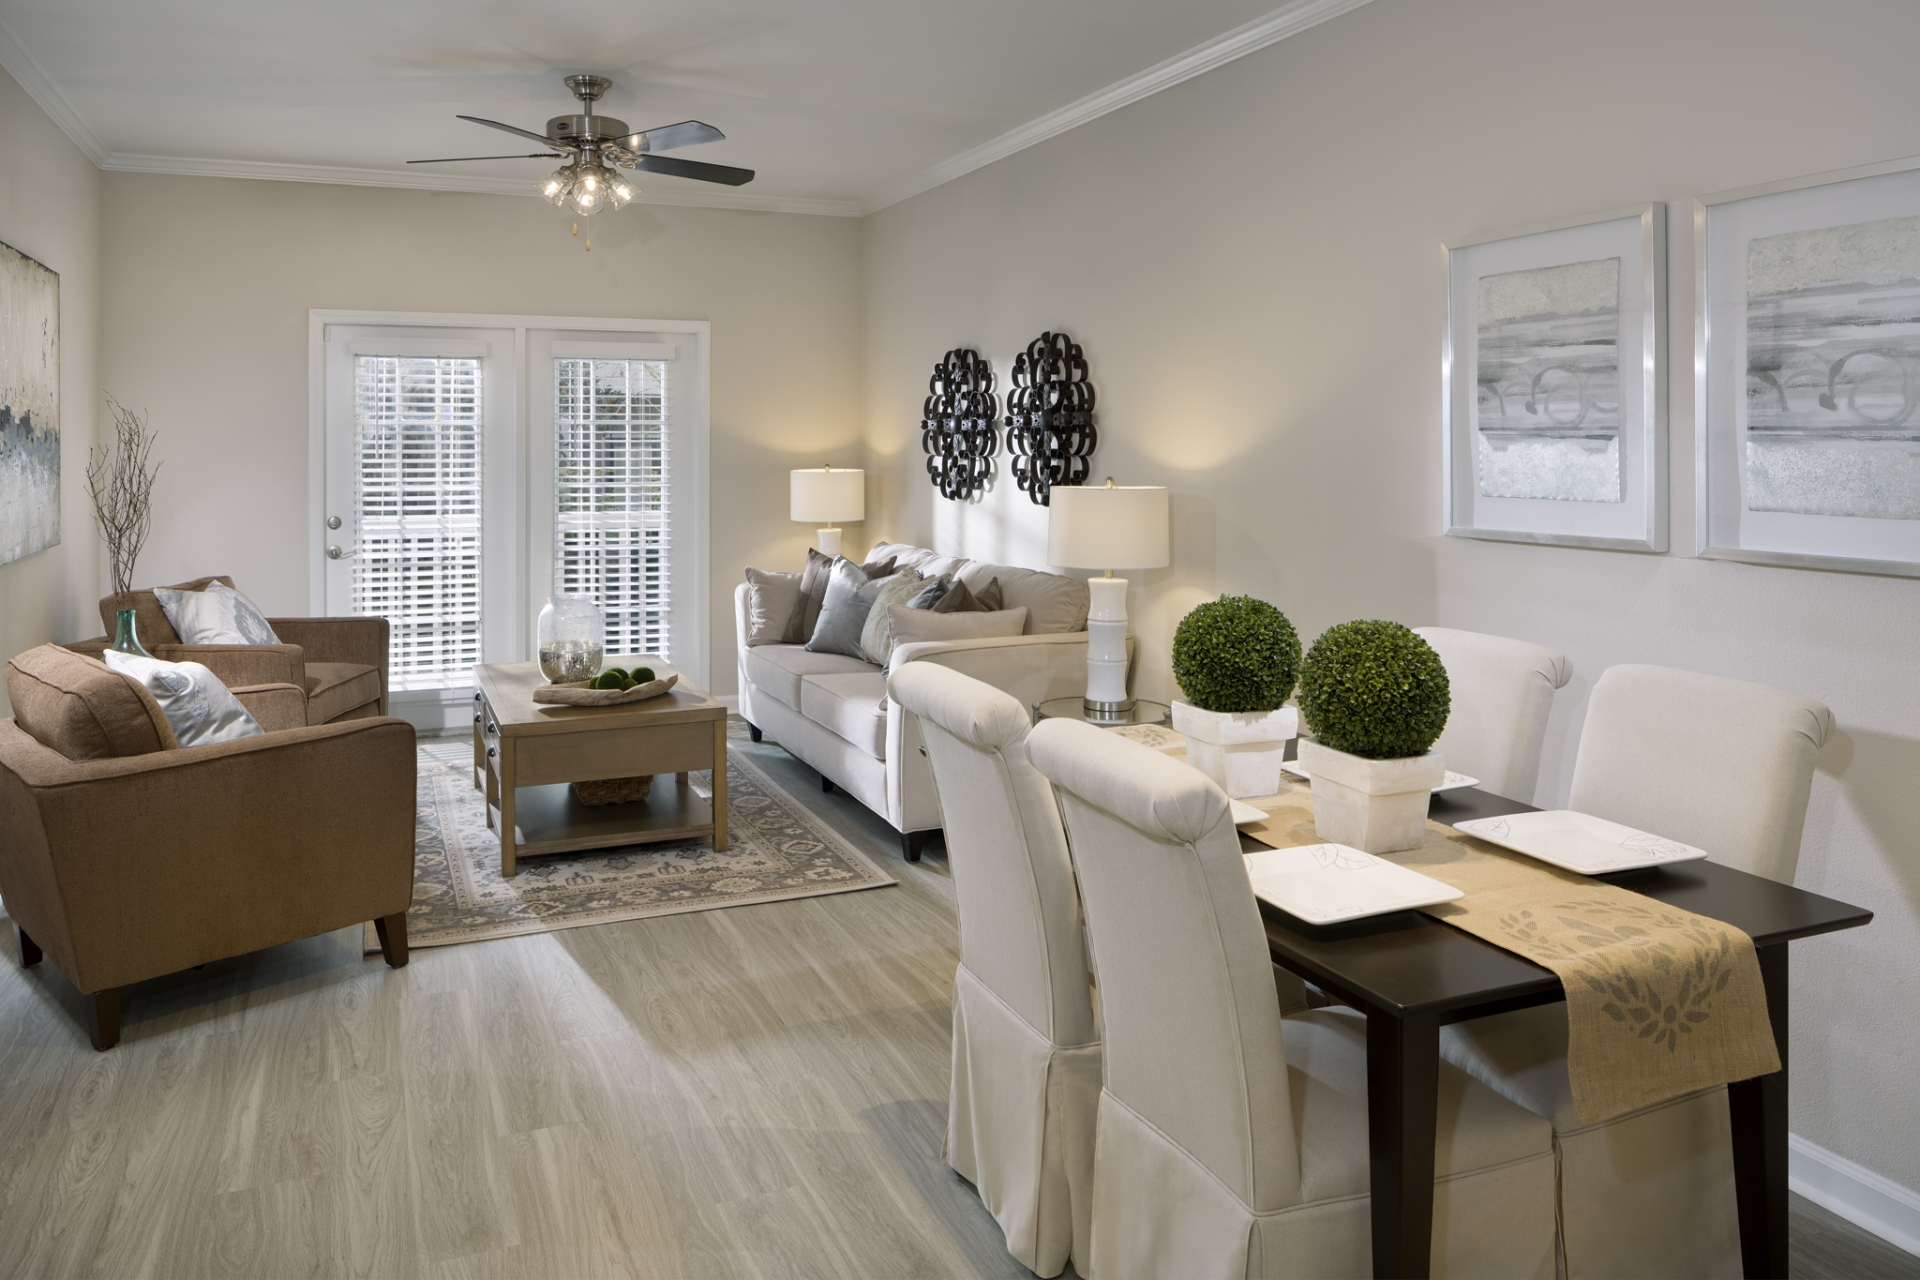 Camden Creekstone Apartments image 1